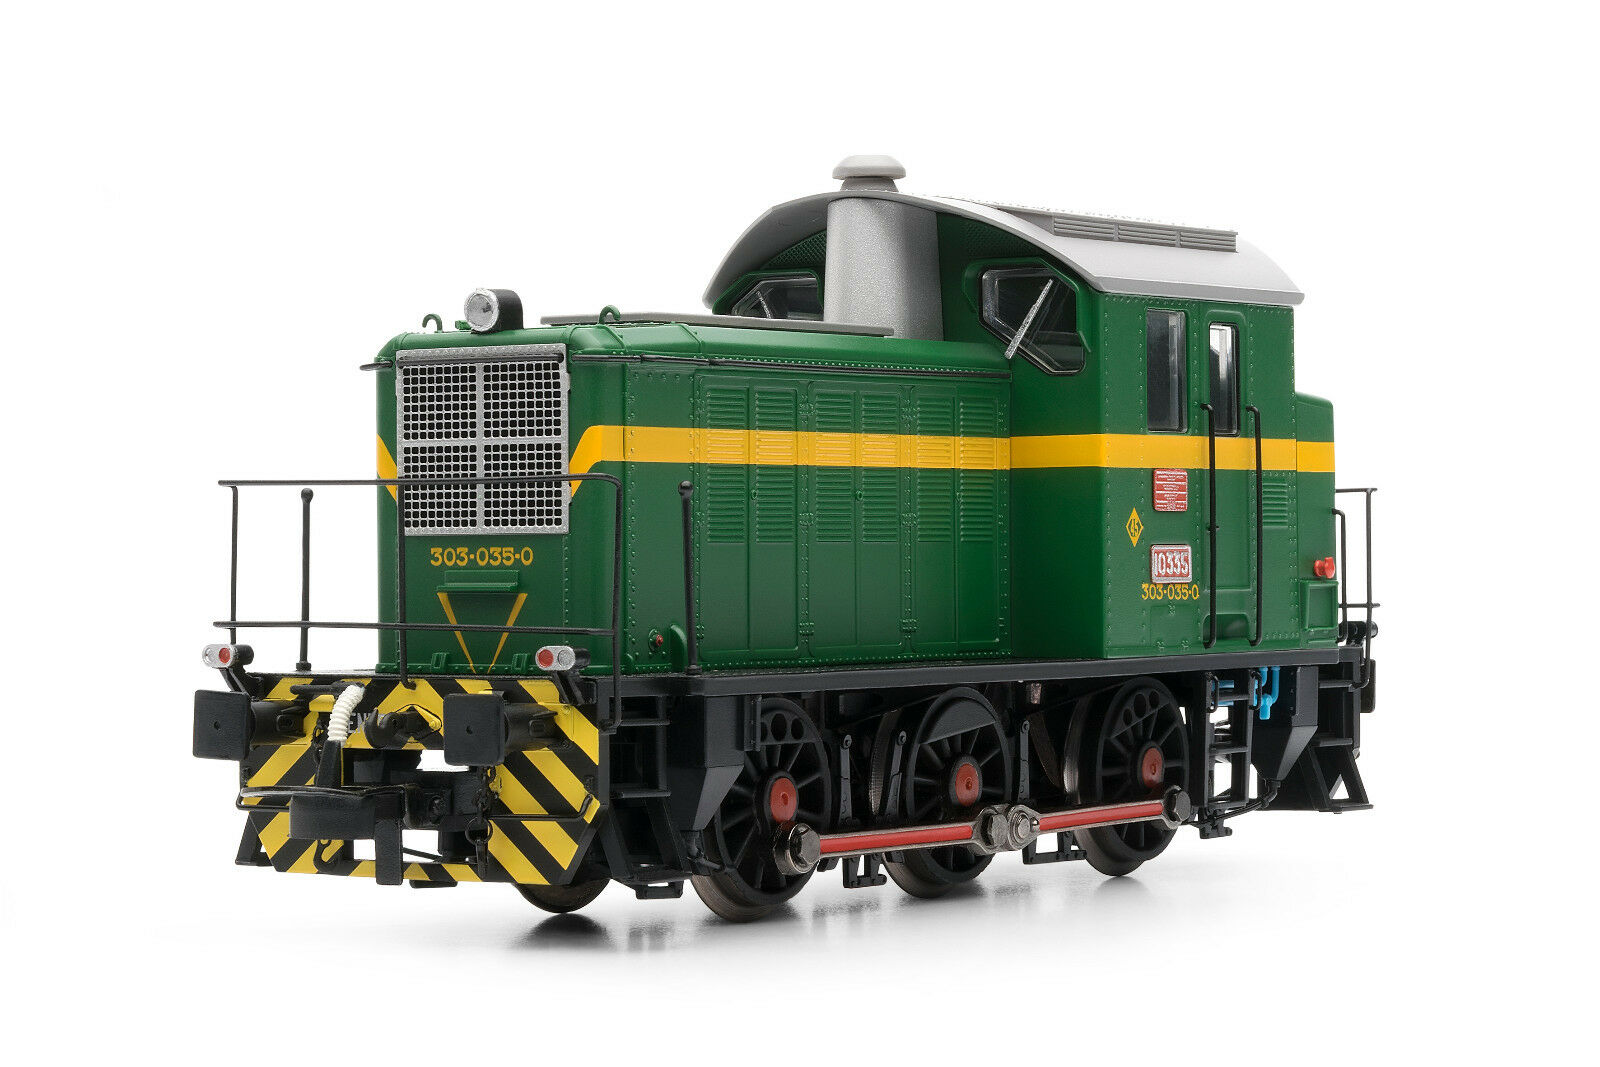 Electrossoren e3810 diesel locomotora diesel Renfe 303.035 verde y giallo EP. IV